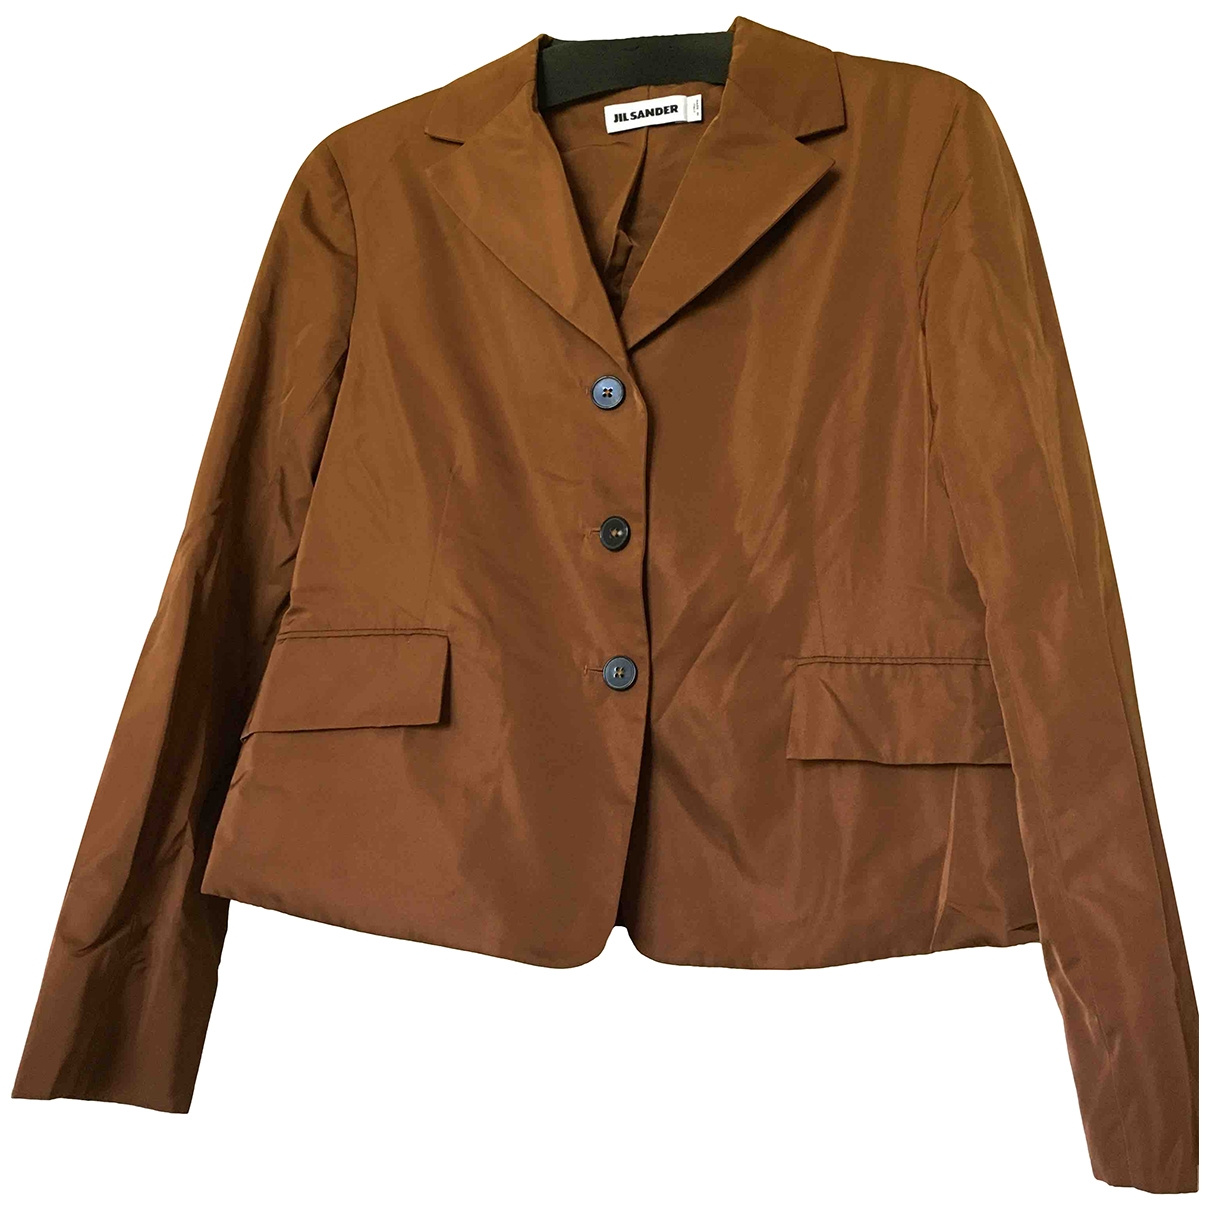 Jil Sander \N Brown jacket for Women 38 IT